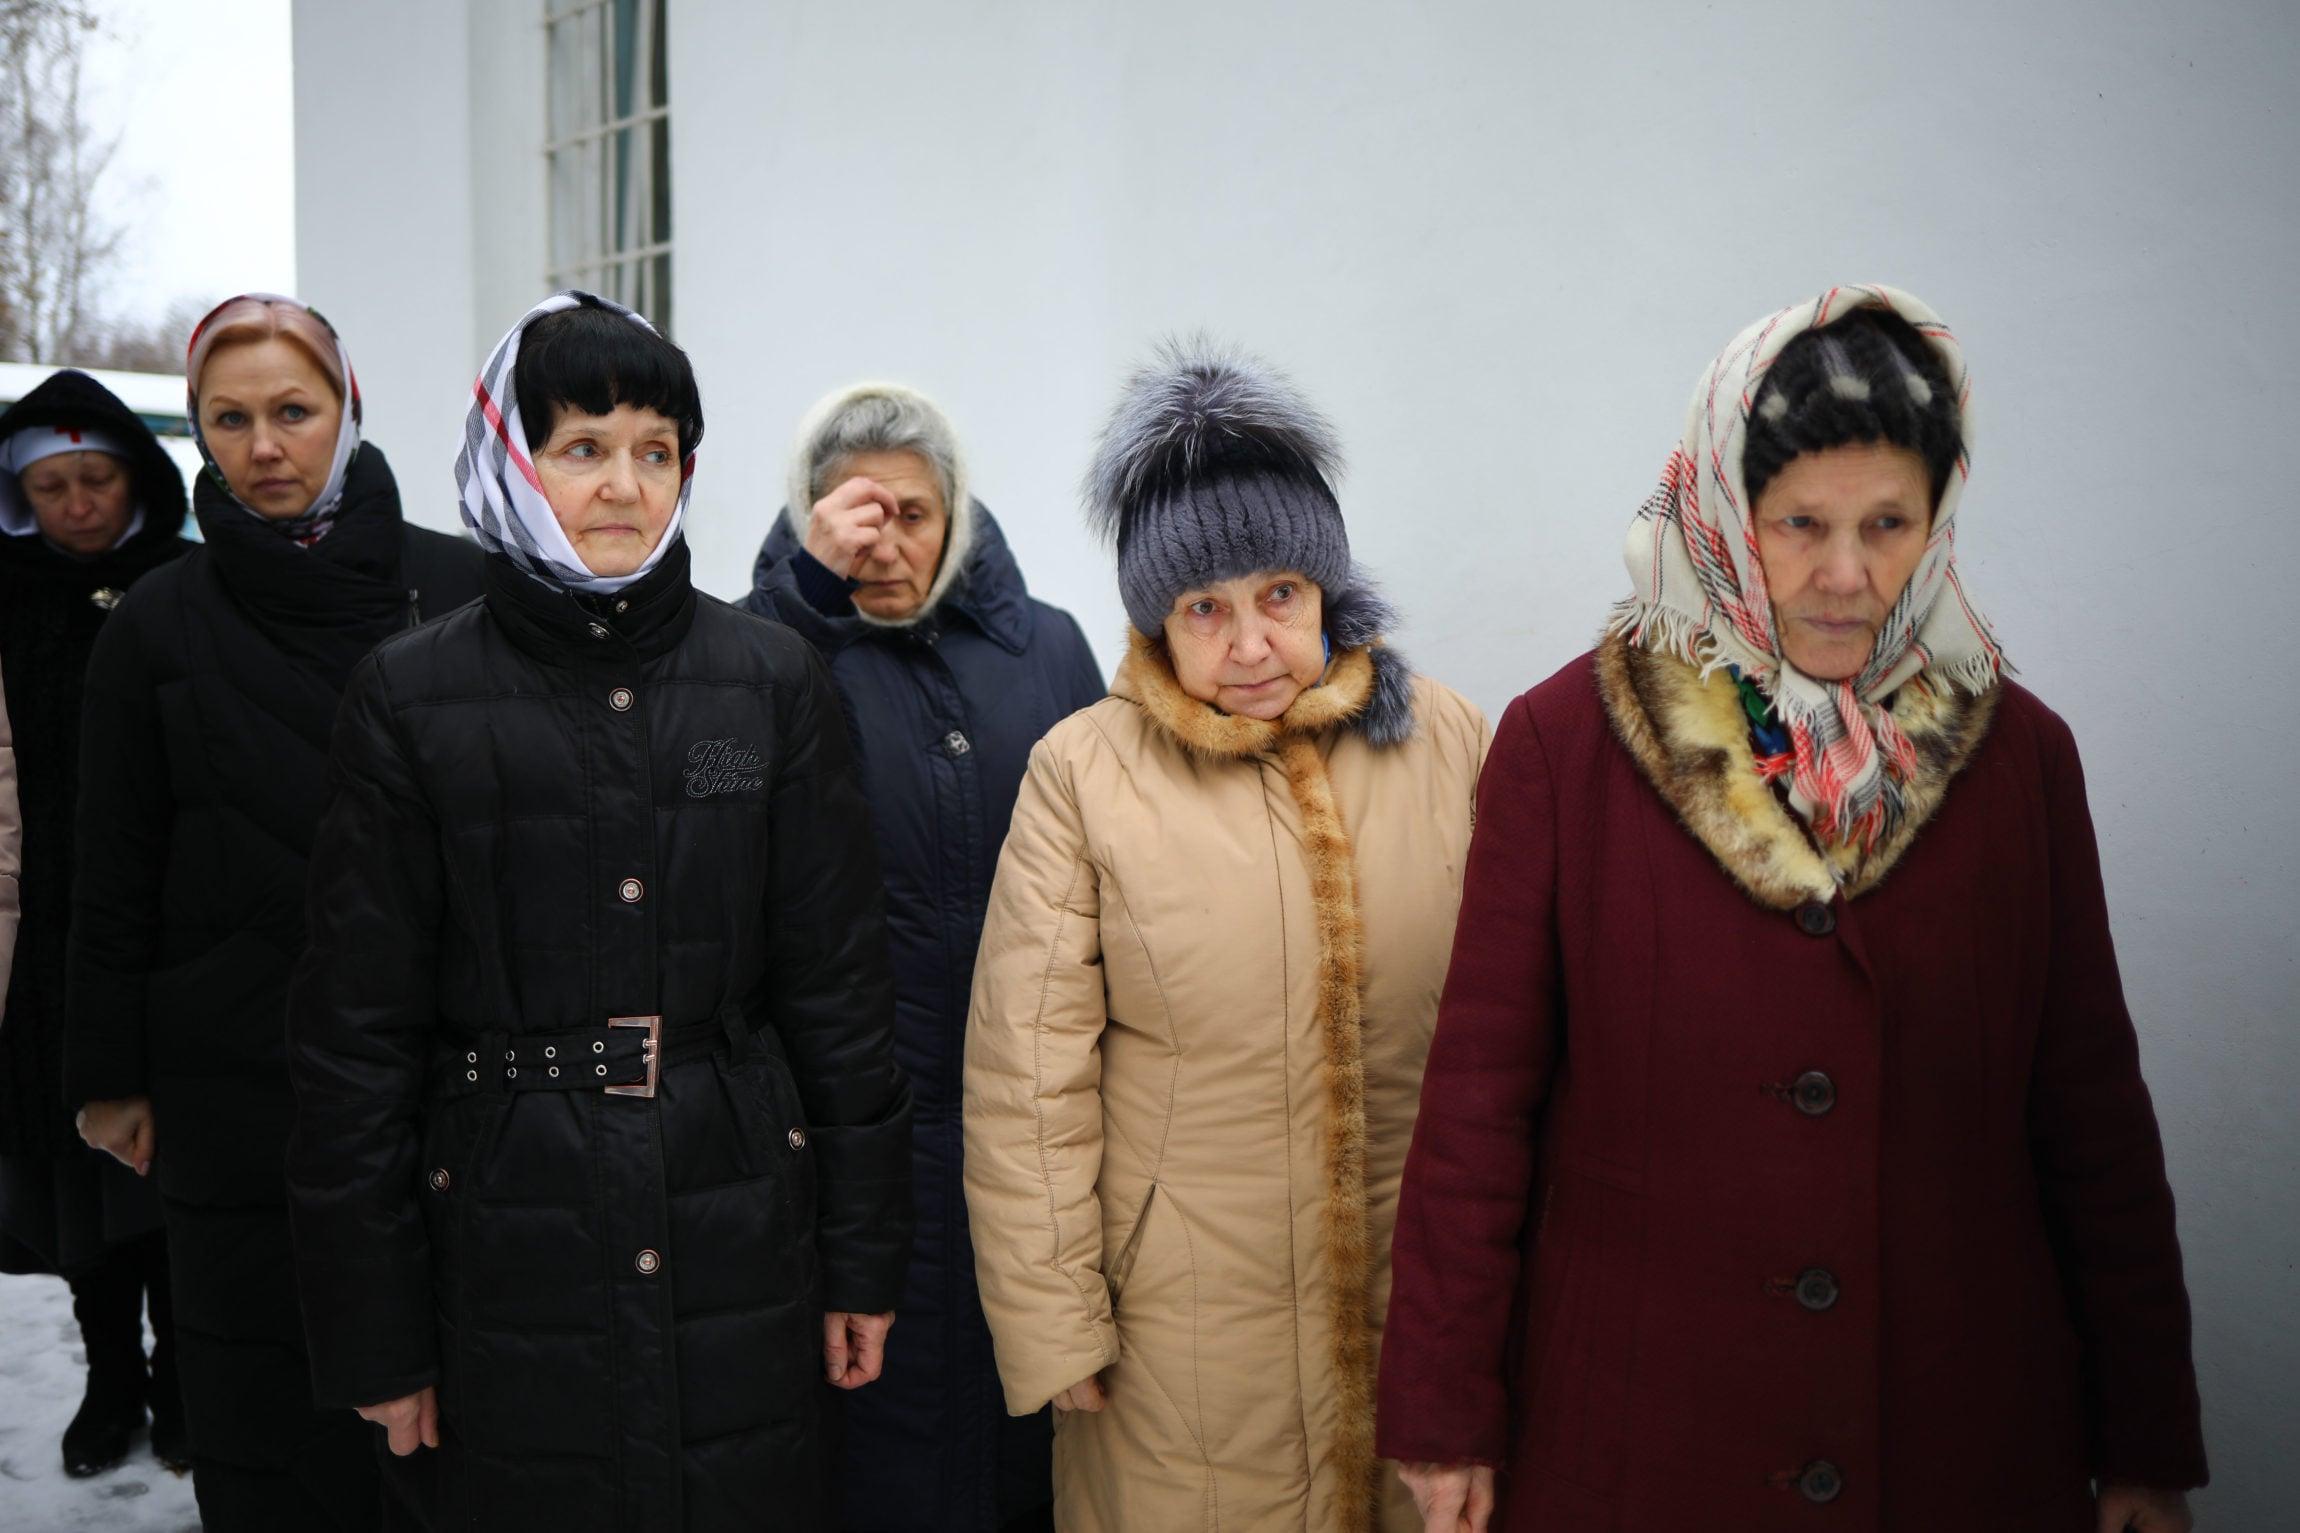 http://monuspen.ru/photoreports/c00fff2f92d327bb9a4897a413ca456v.jpg